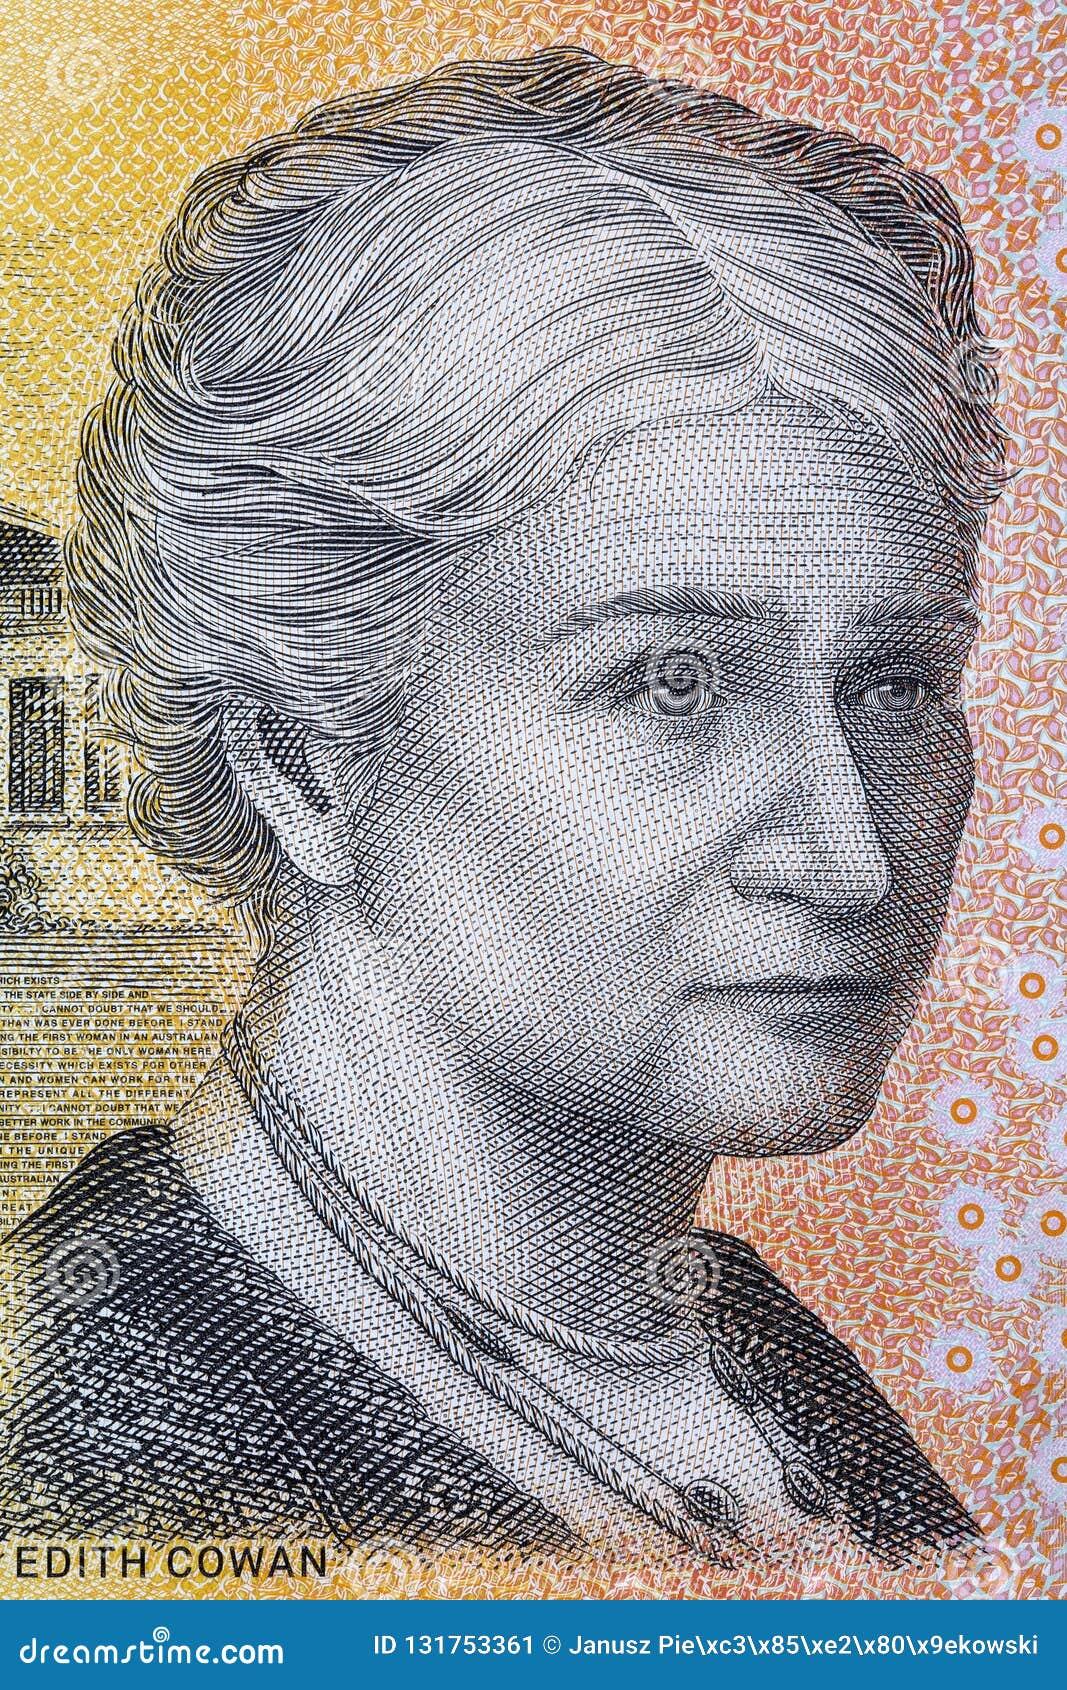 Edith Cowan a portrait